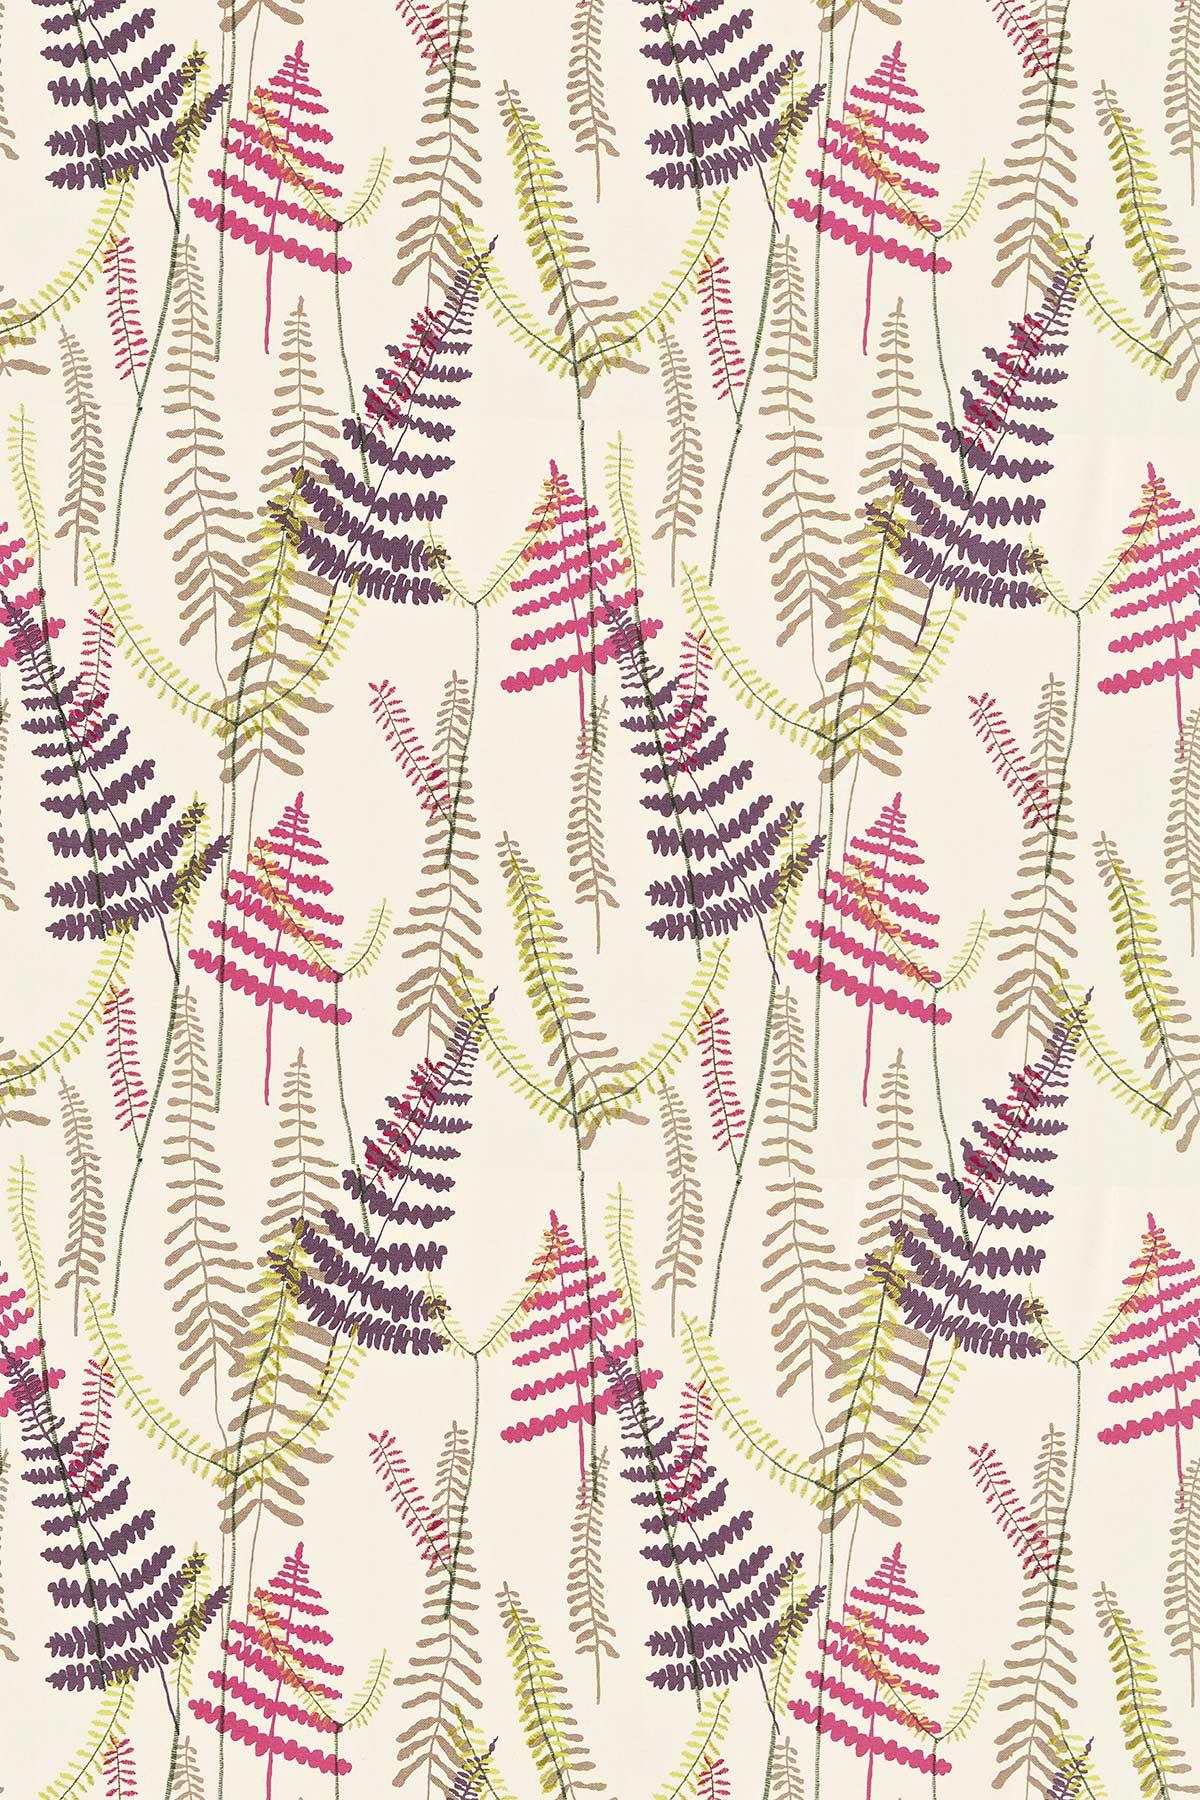 Athyrium Fabric - Plum, Fuchsia, Linen and Lime - by Scion